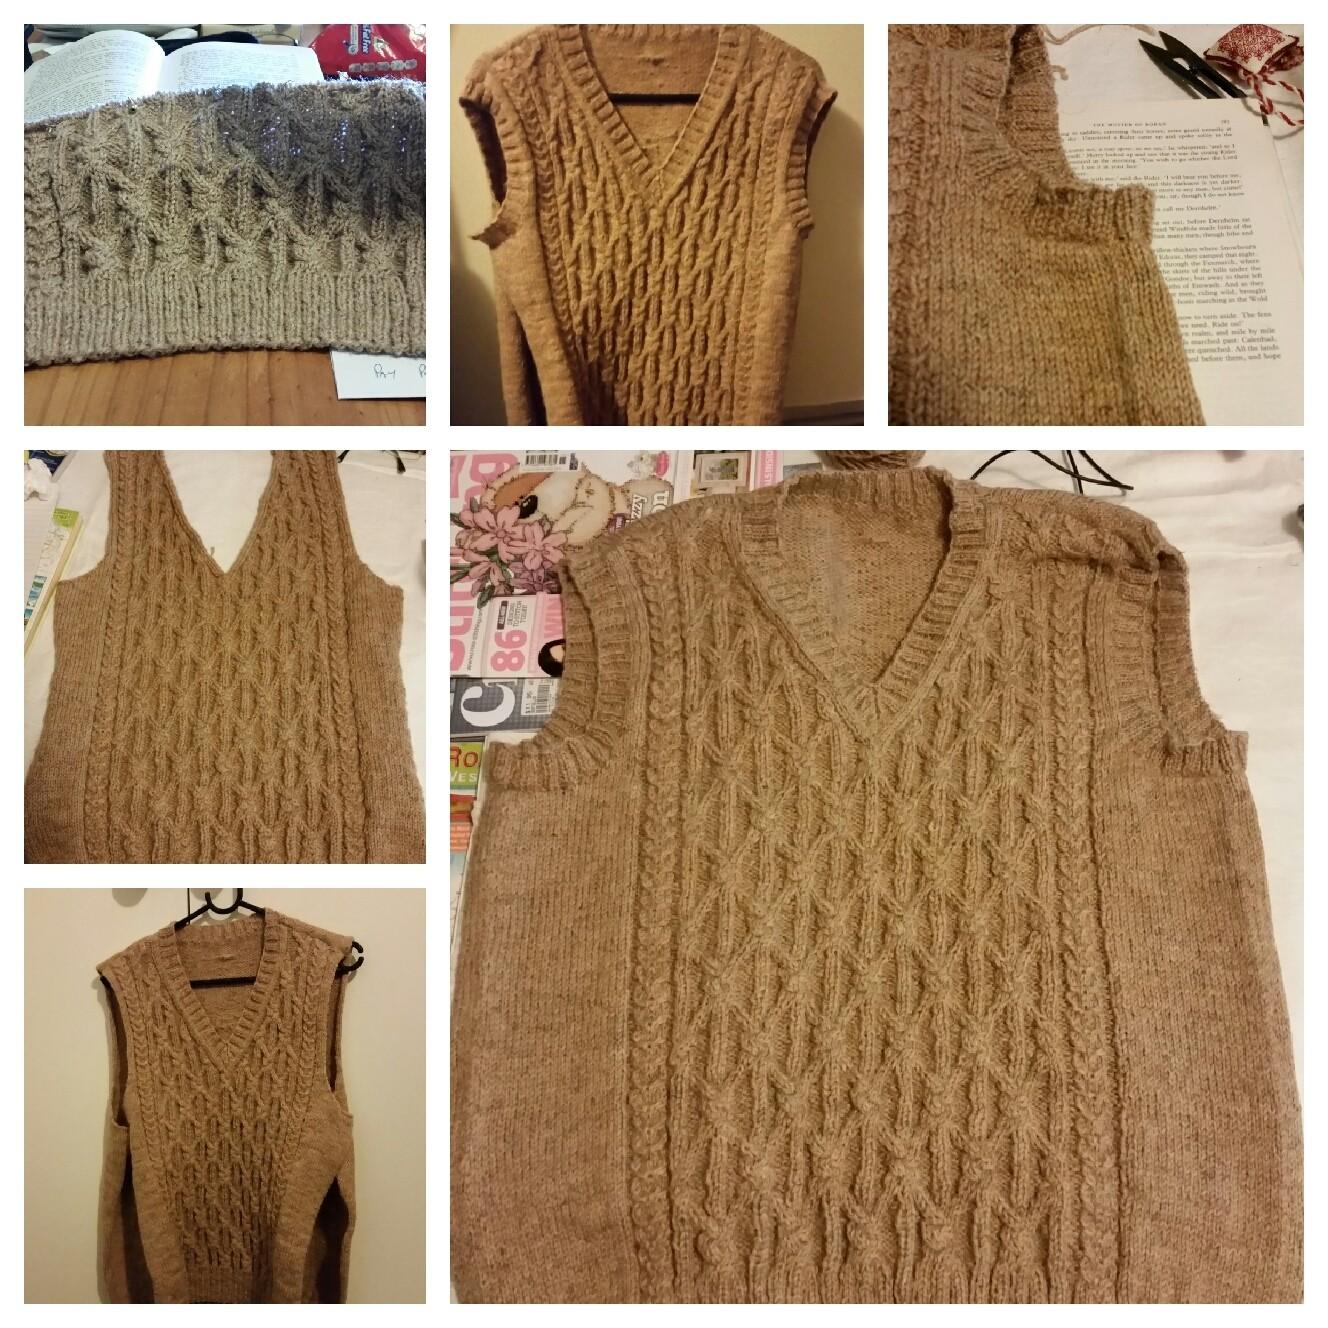 Cabled vest - part one